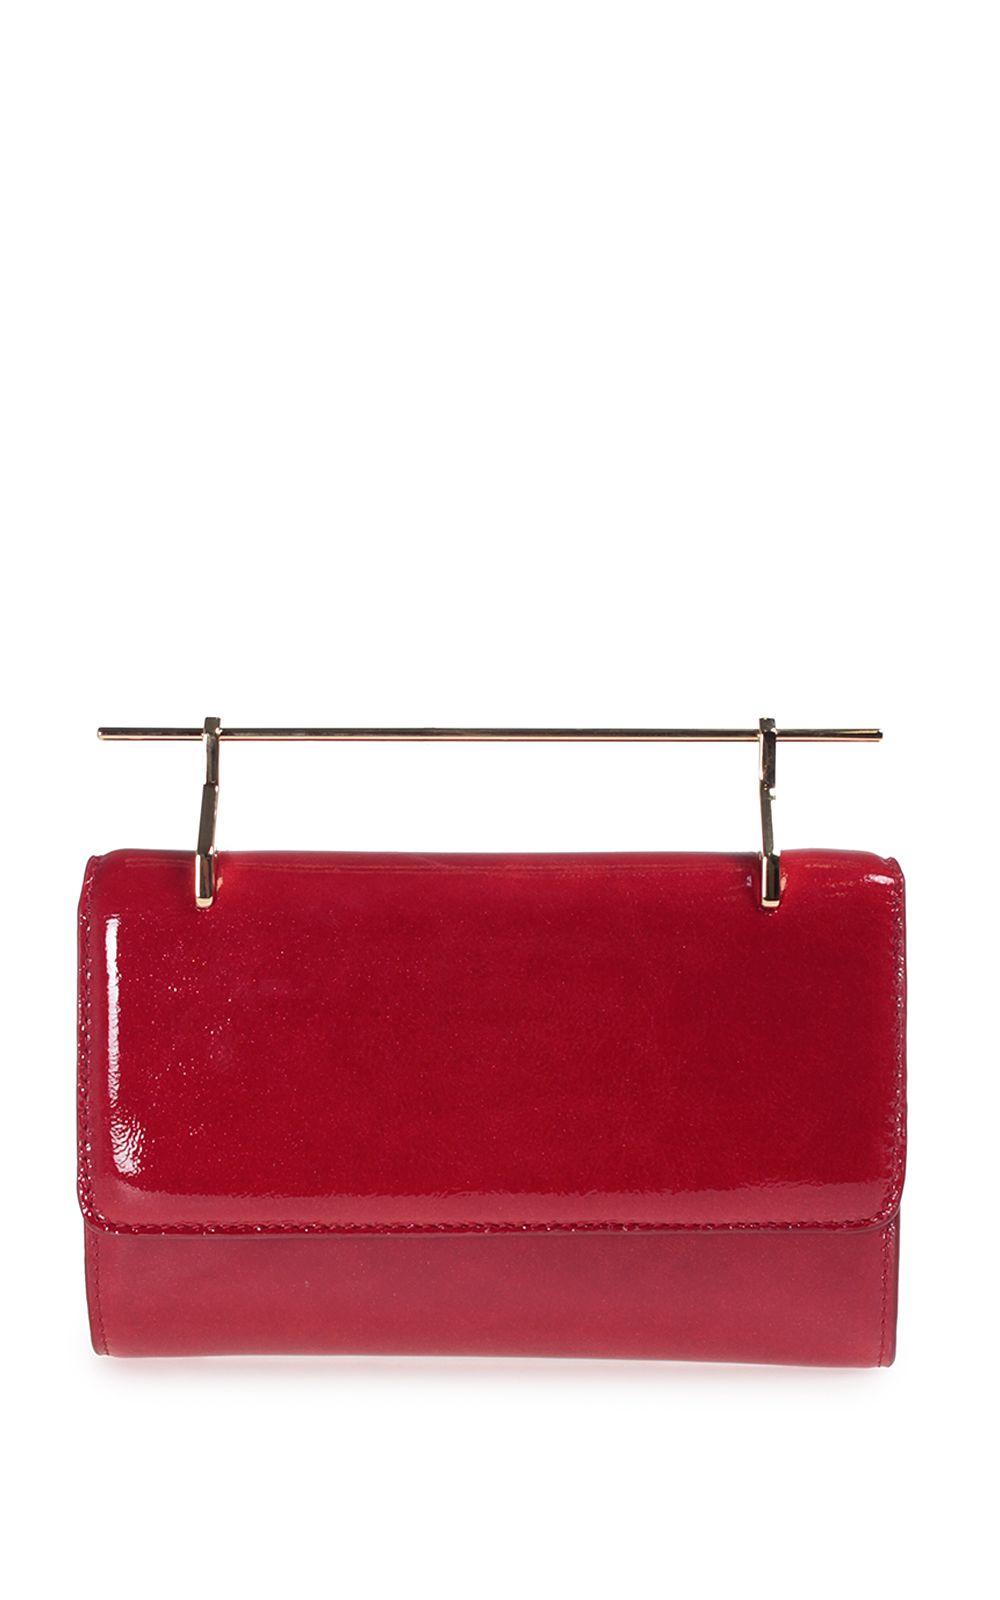 M2Malletier Fabricca Patent-leather Handbag